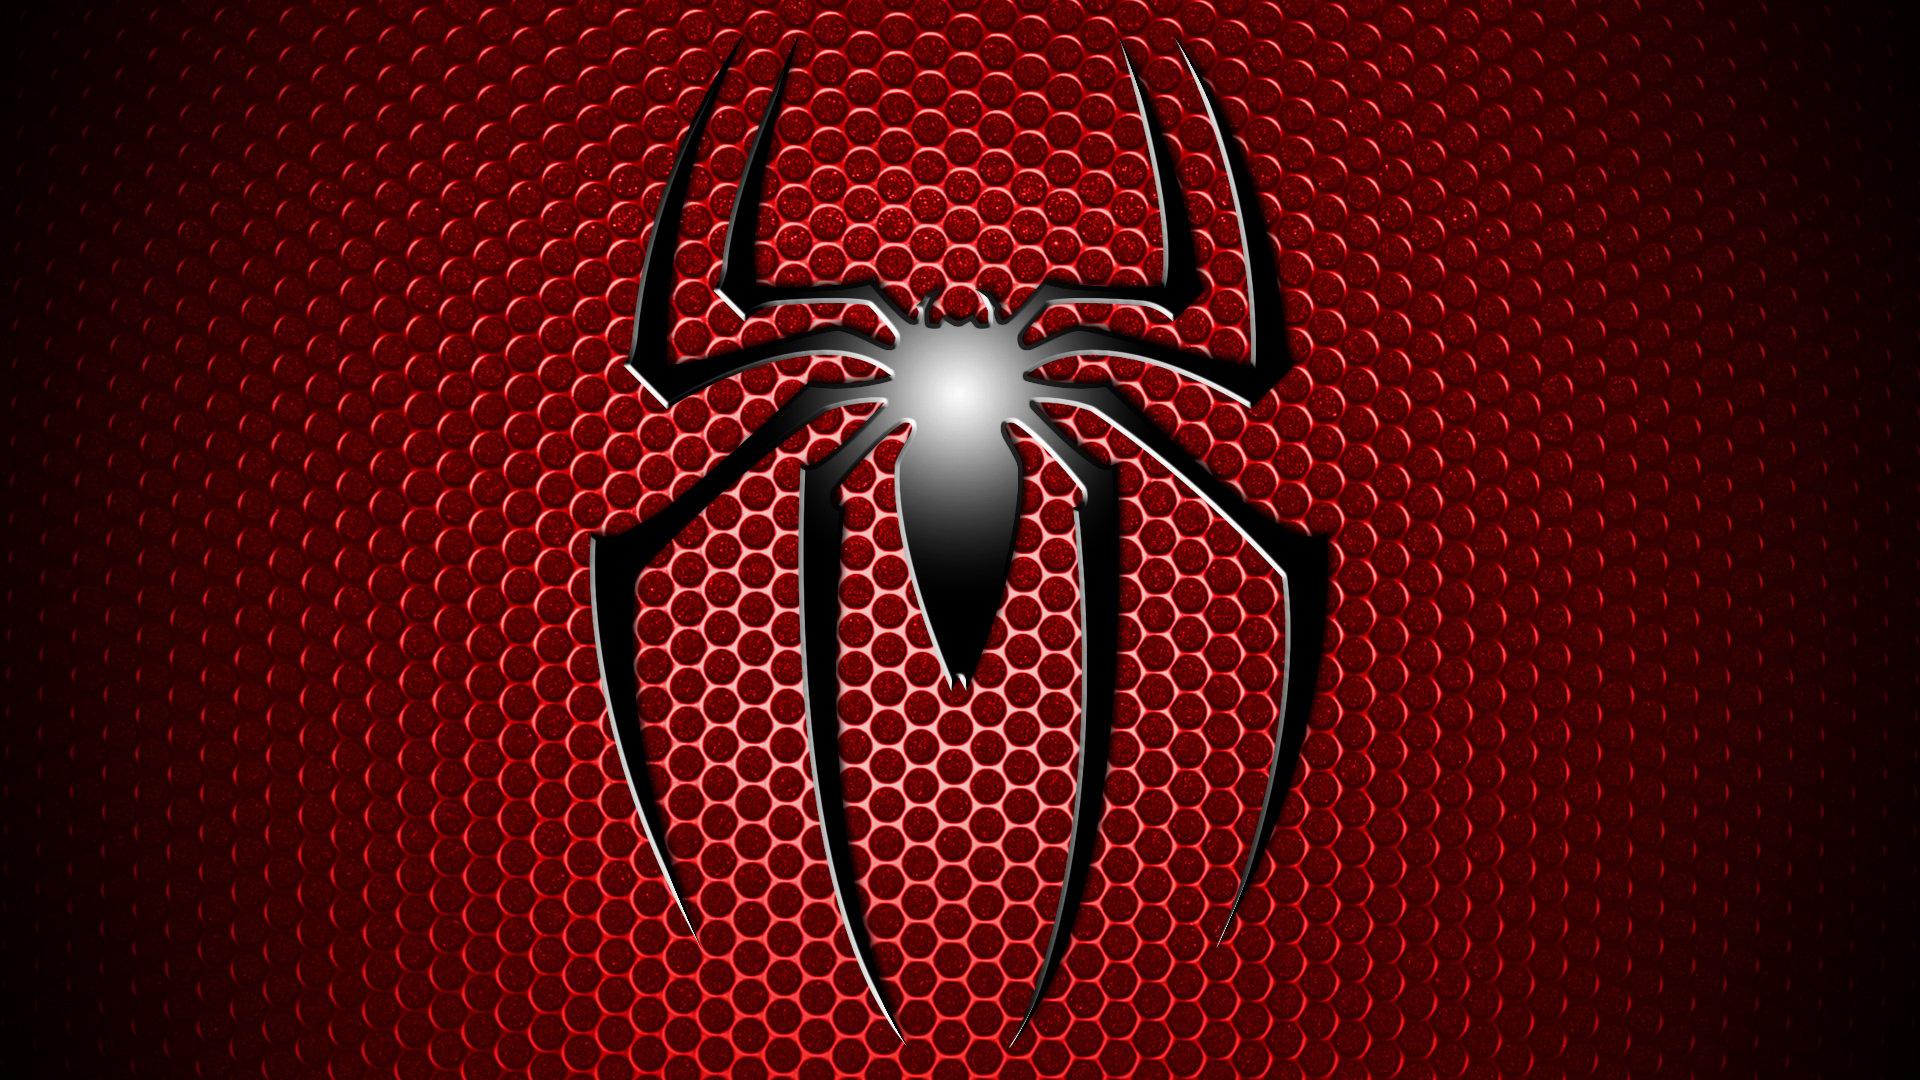 Spider Man Spider Man Logo Symbol Red Grid Black Simple Wallpaper 1920x1080